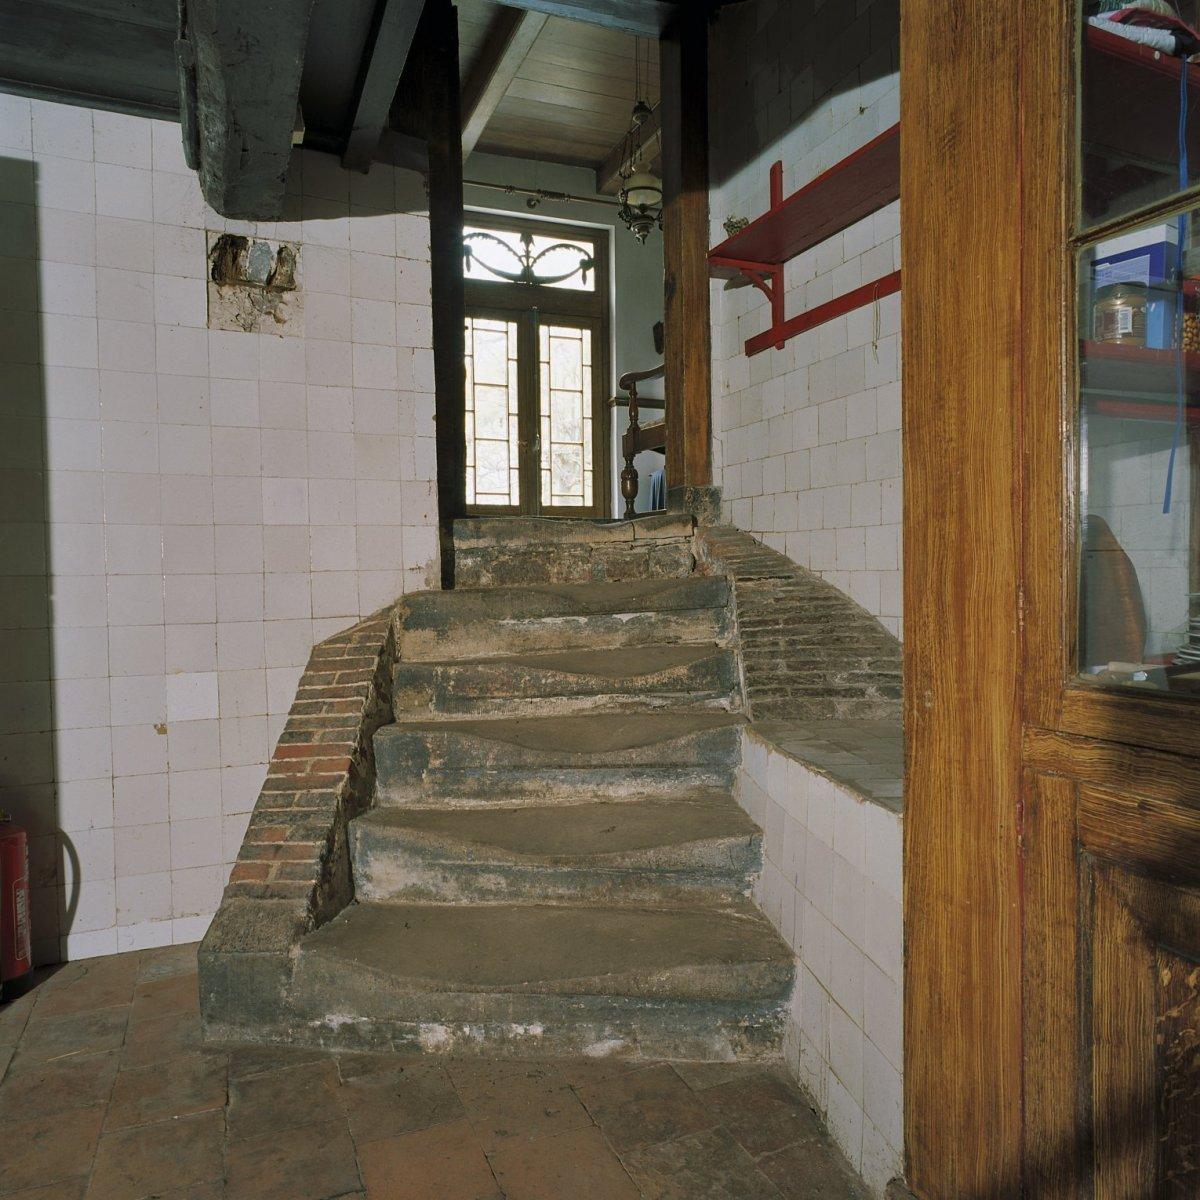 File interieur trap in de kelder ezinge 20380865 wikimedia commons - Interieur trap ...